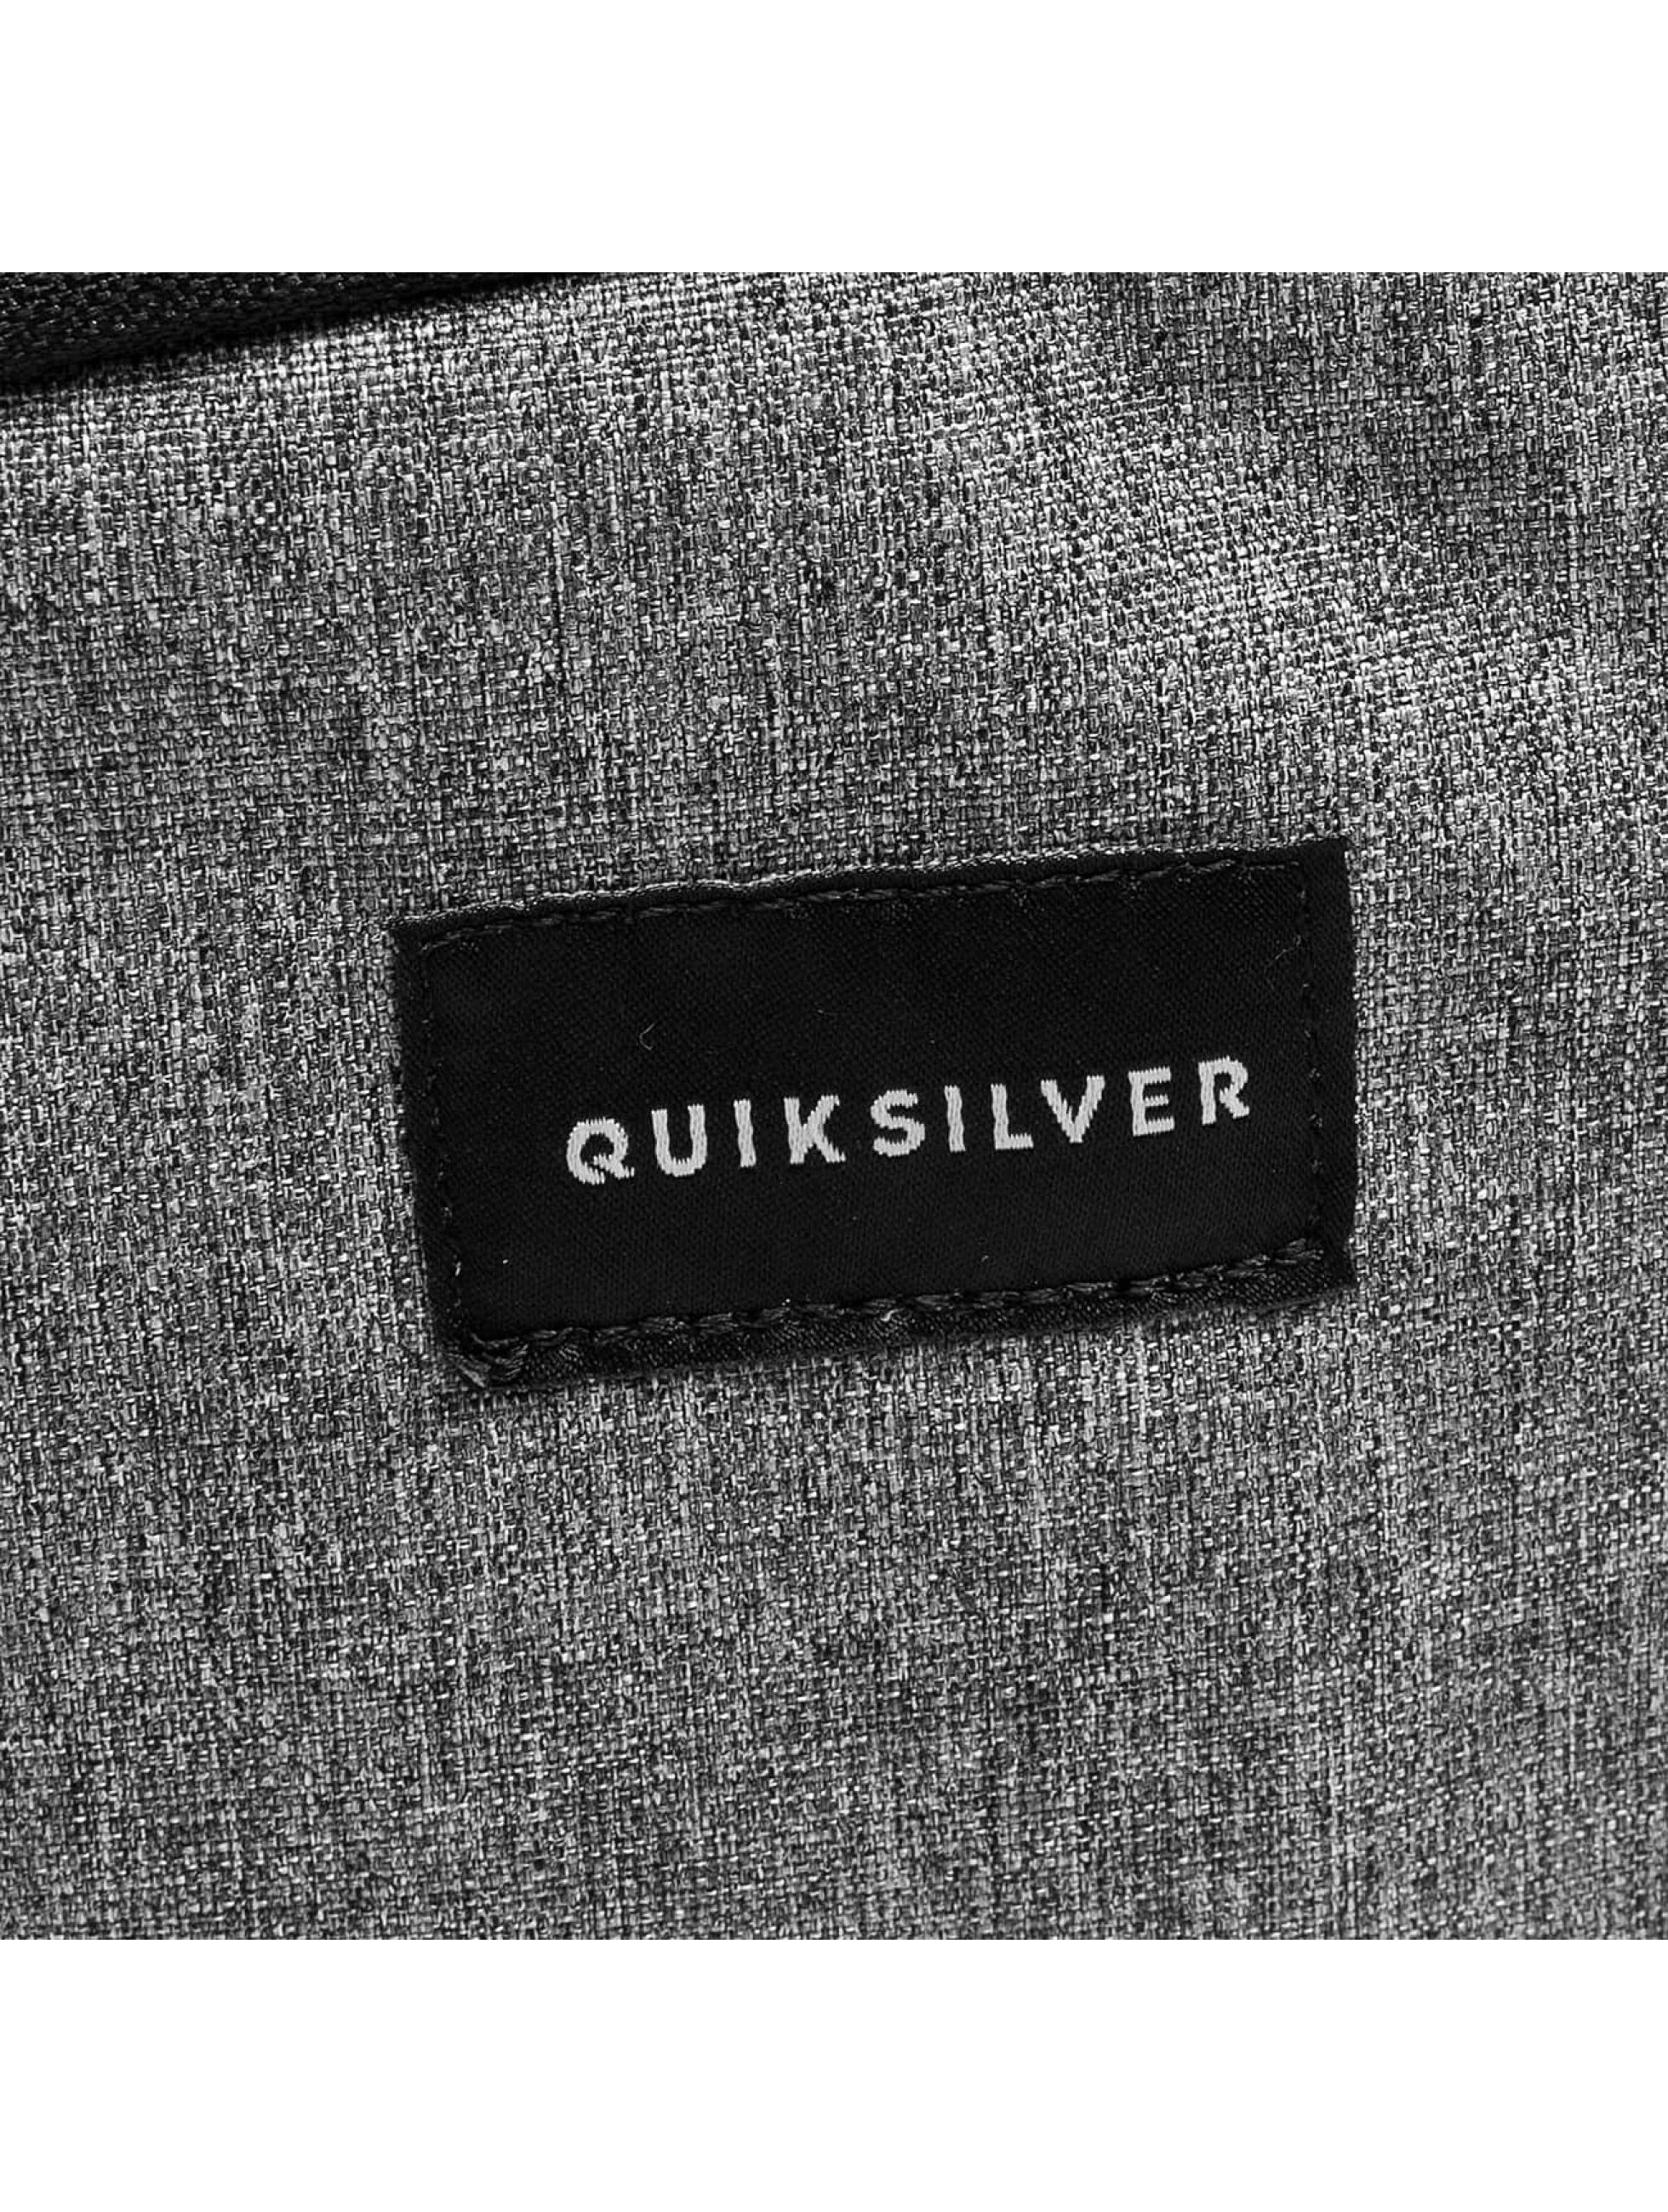 Quiksilver rugzak 1969 Special grijs